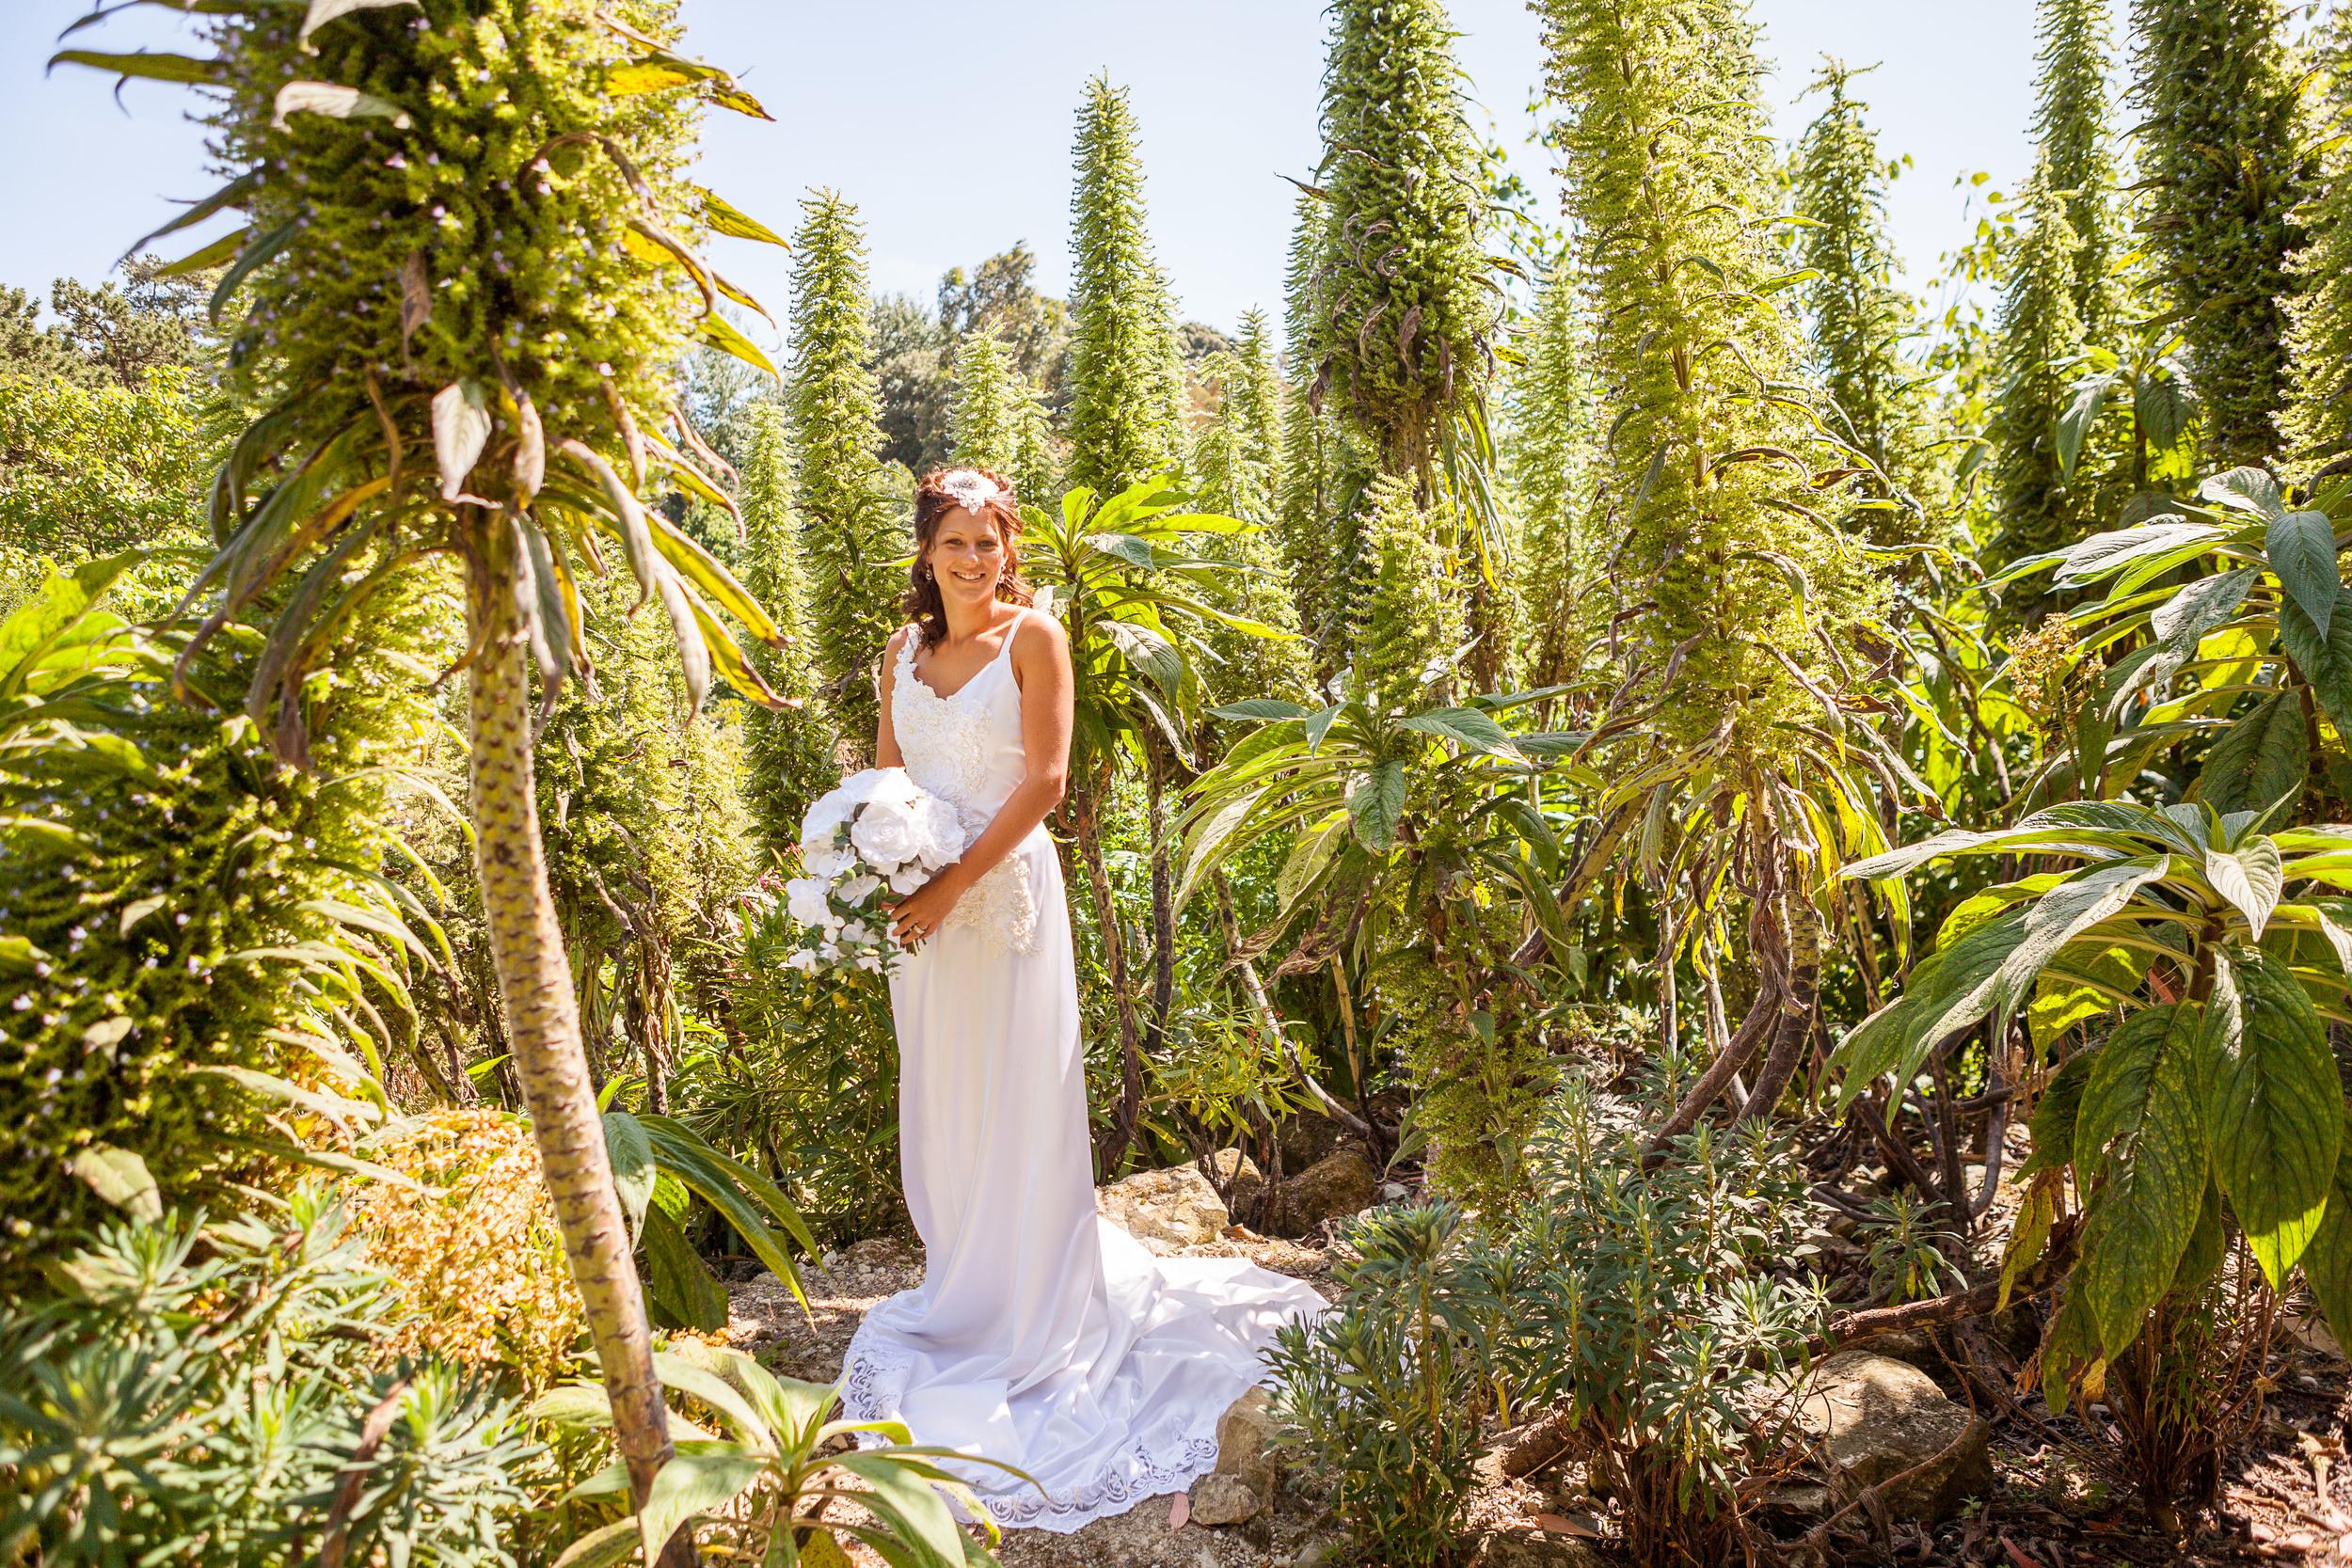 ethical-wedding-VBG-chris-cowley-51.jpg